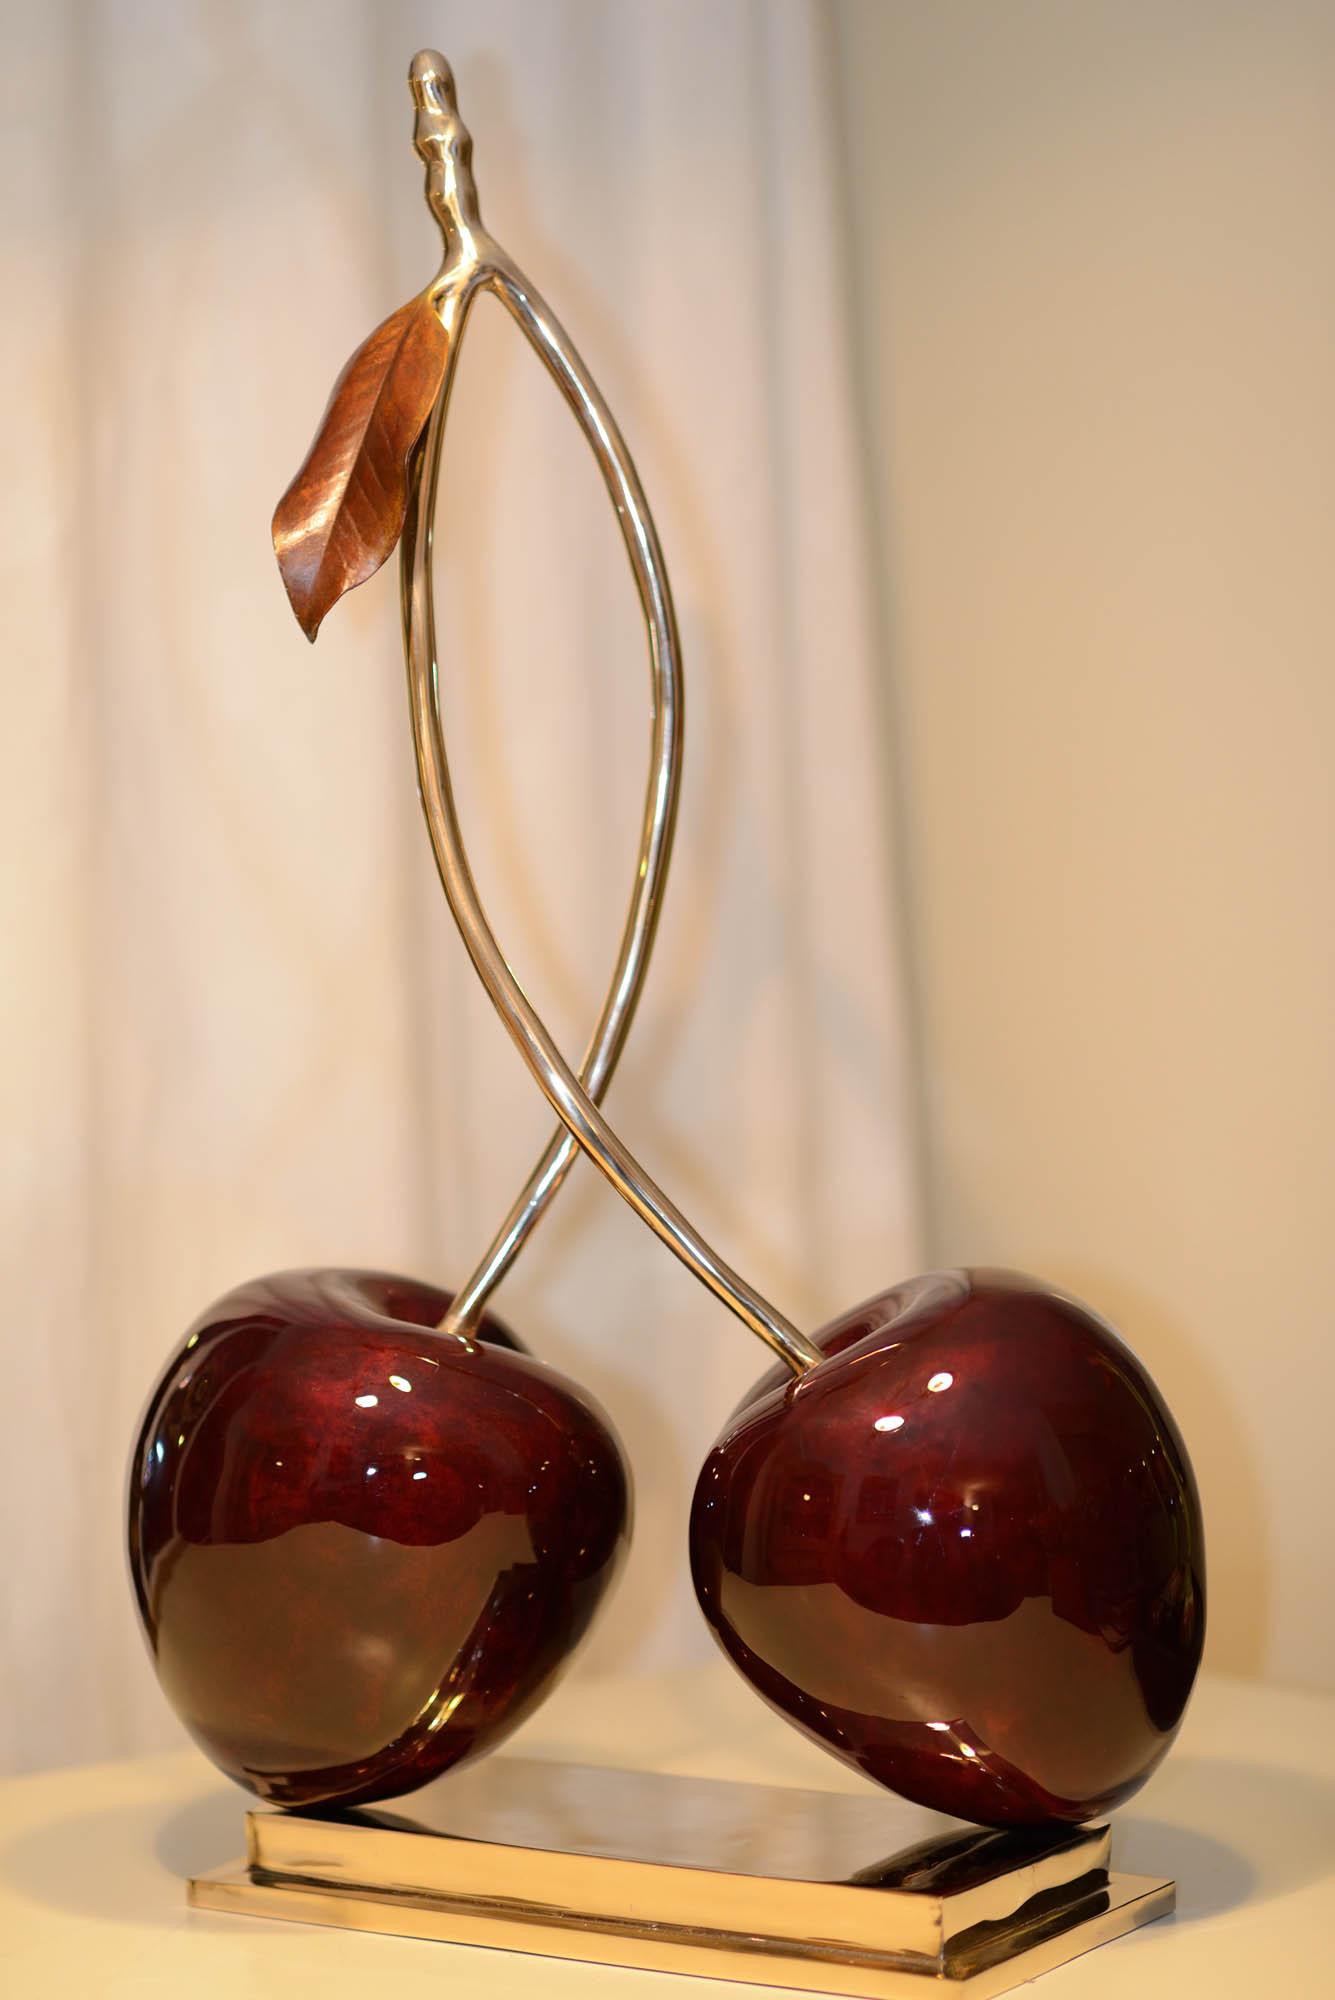 fruit-cherries-sweat-heart-dubbel